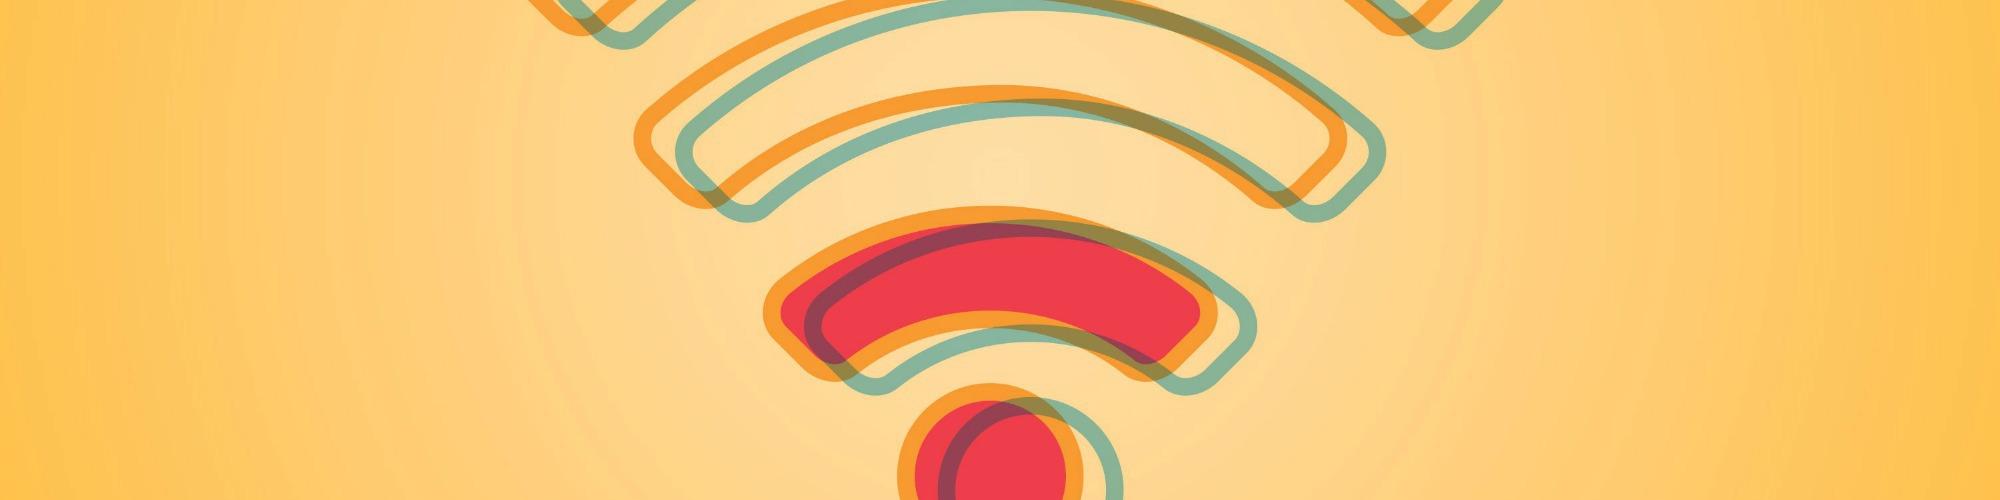 Wifi header